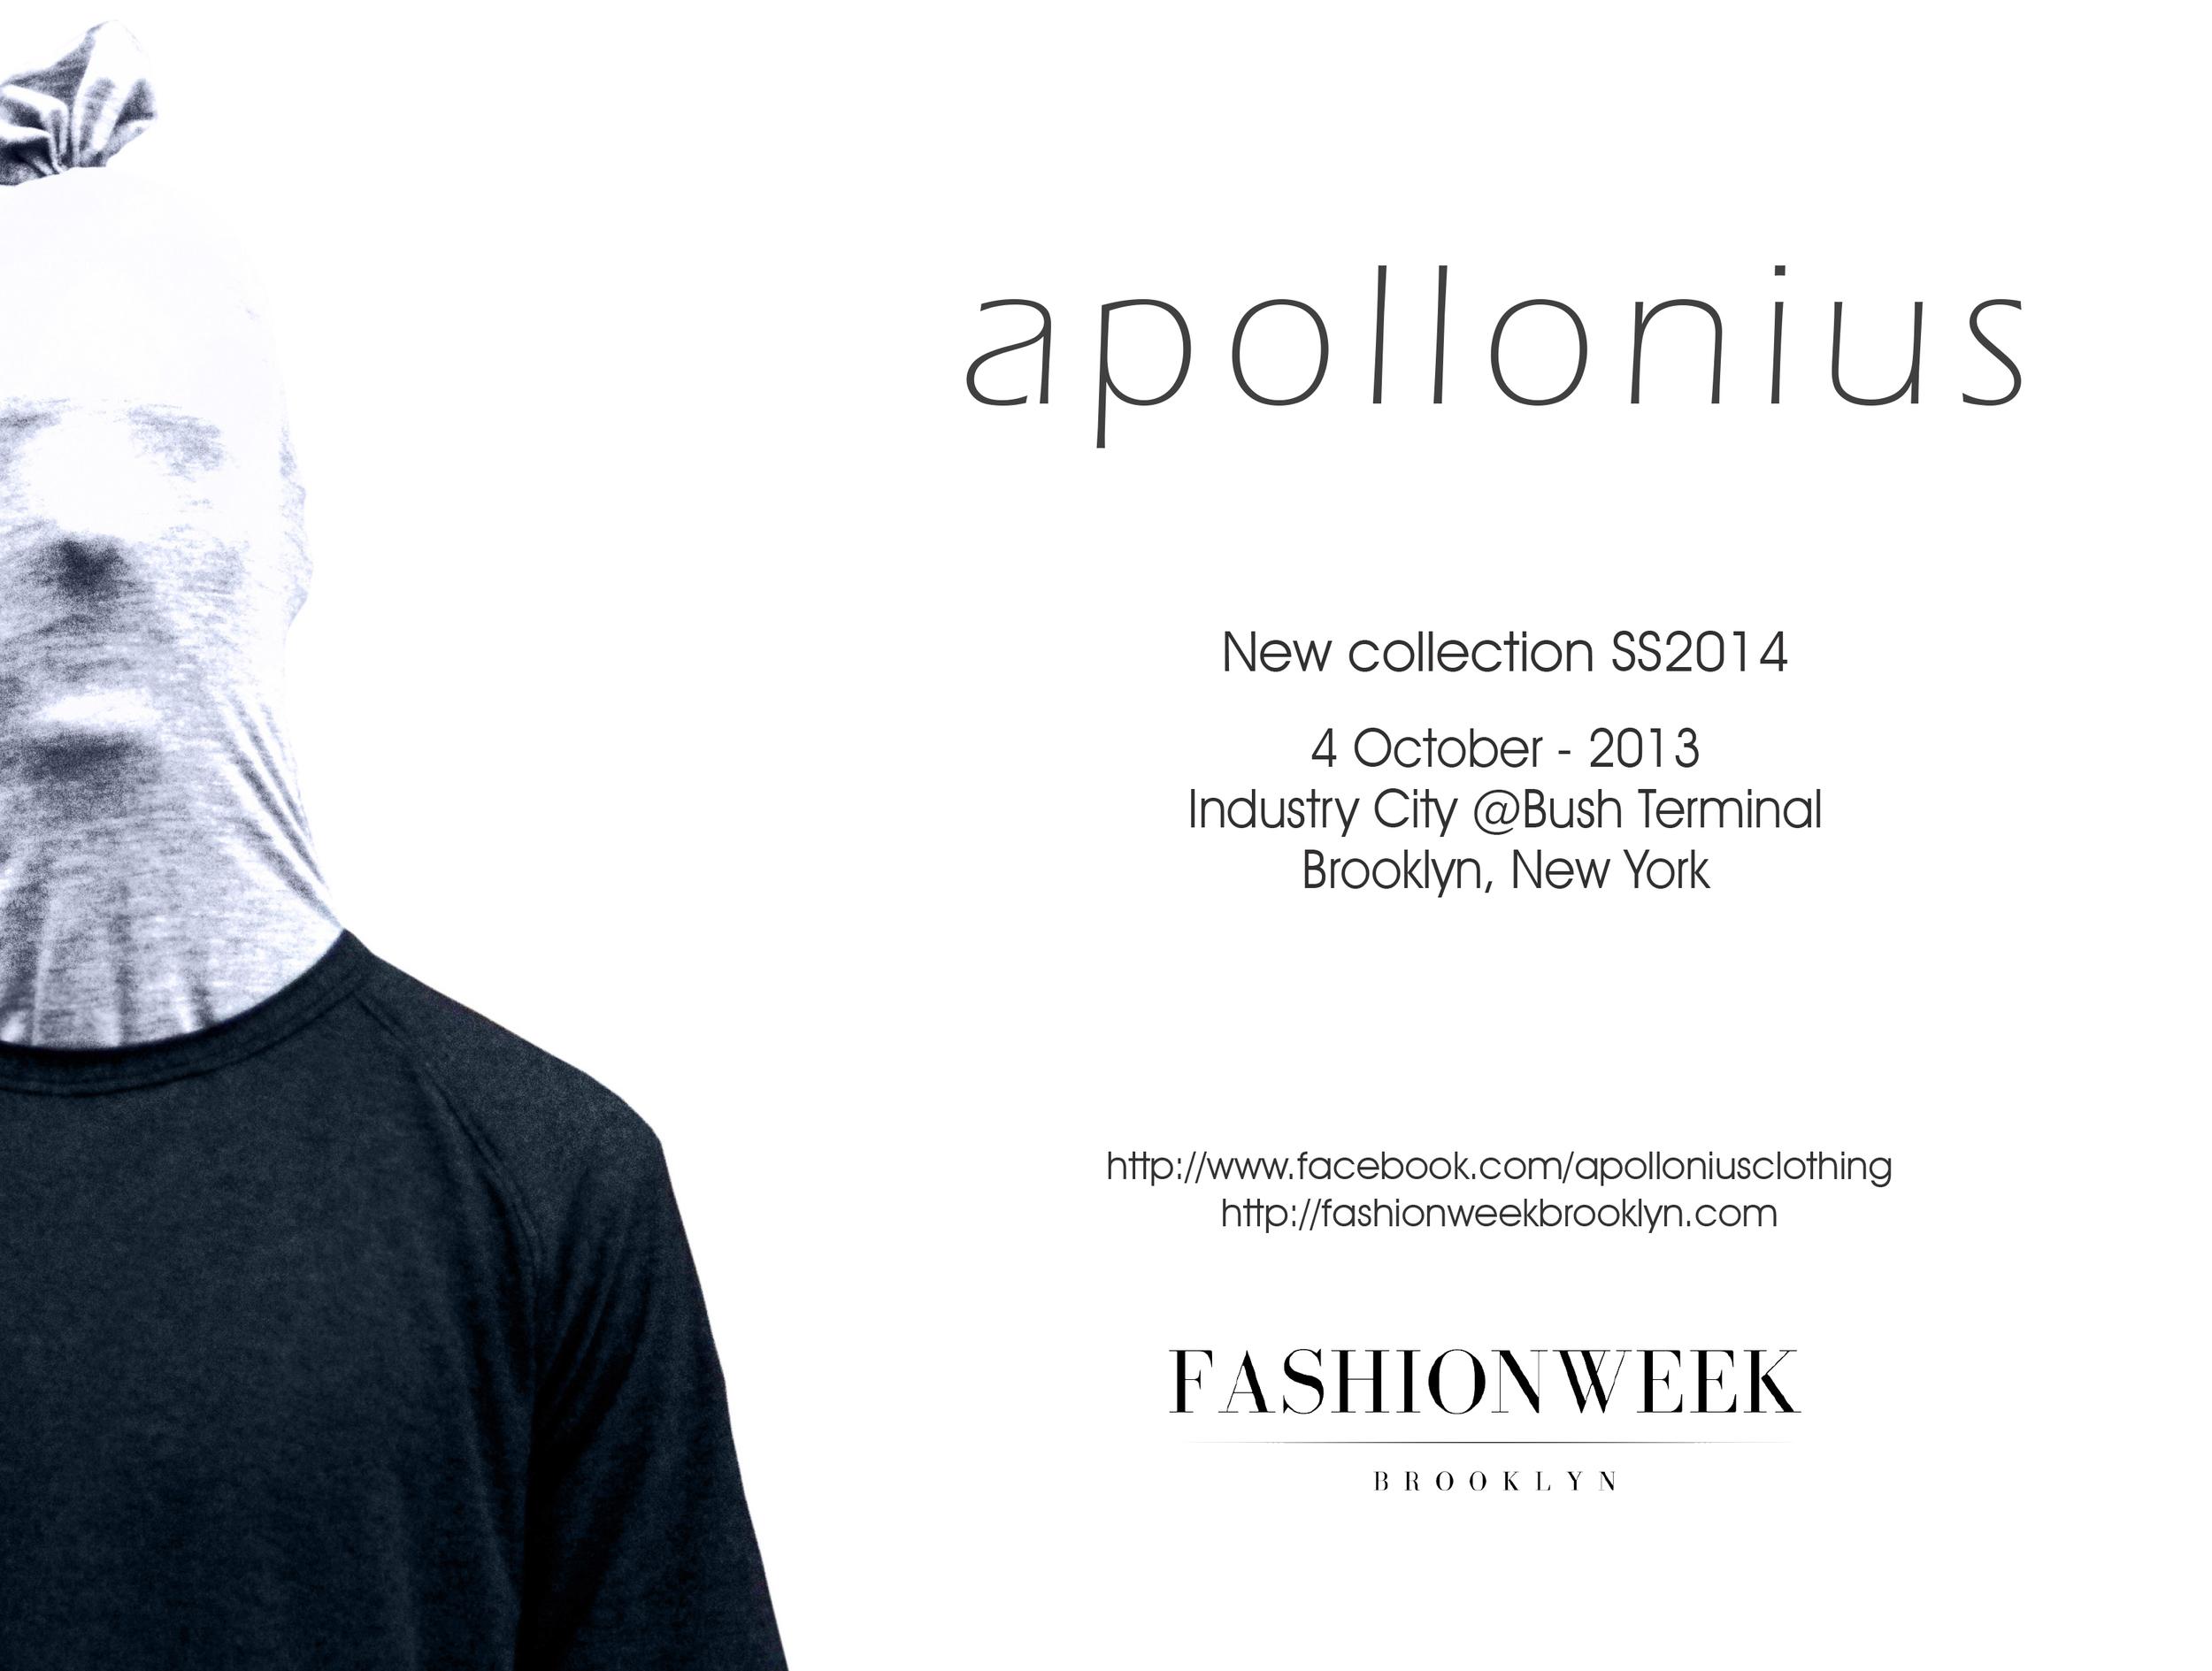 apollonuis-flyer2013-v2.jpg